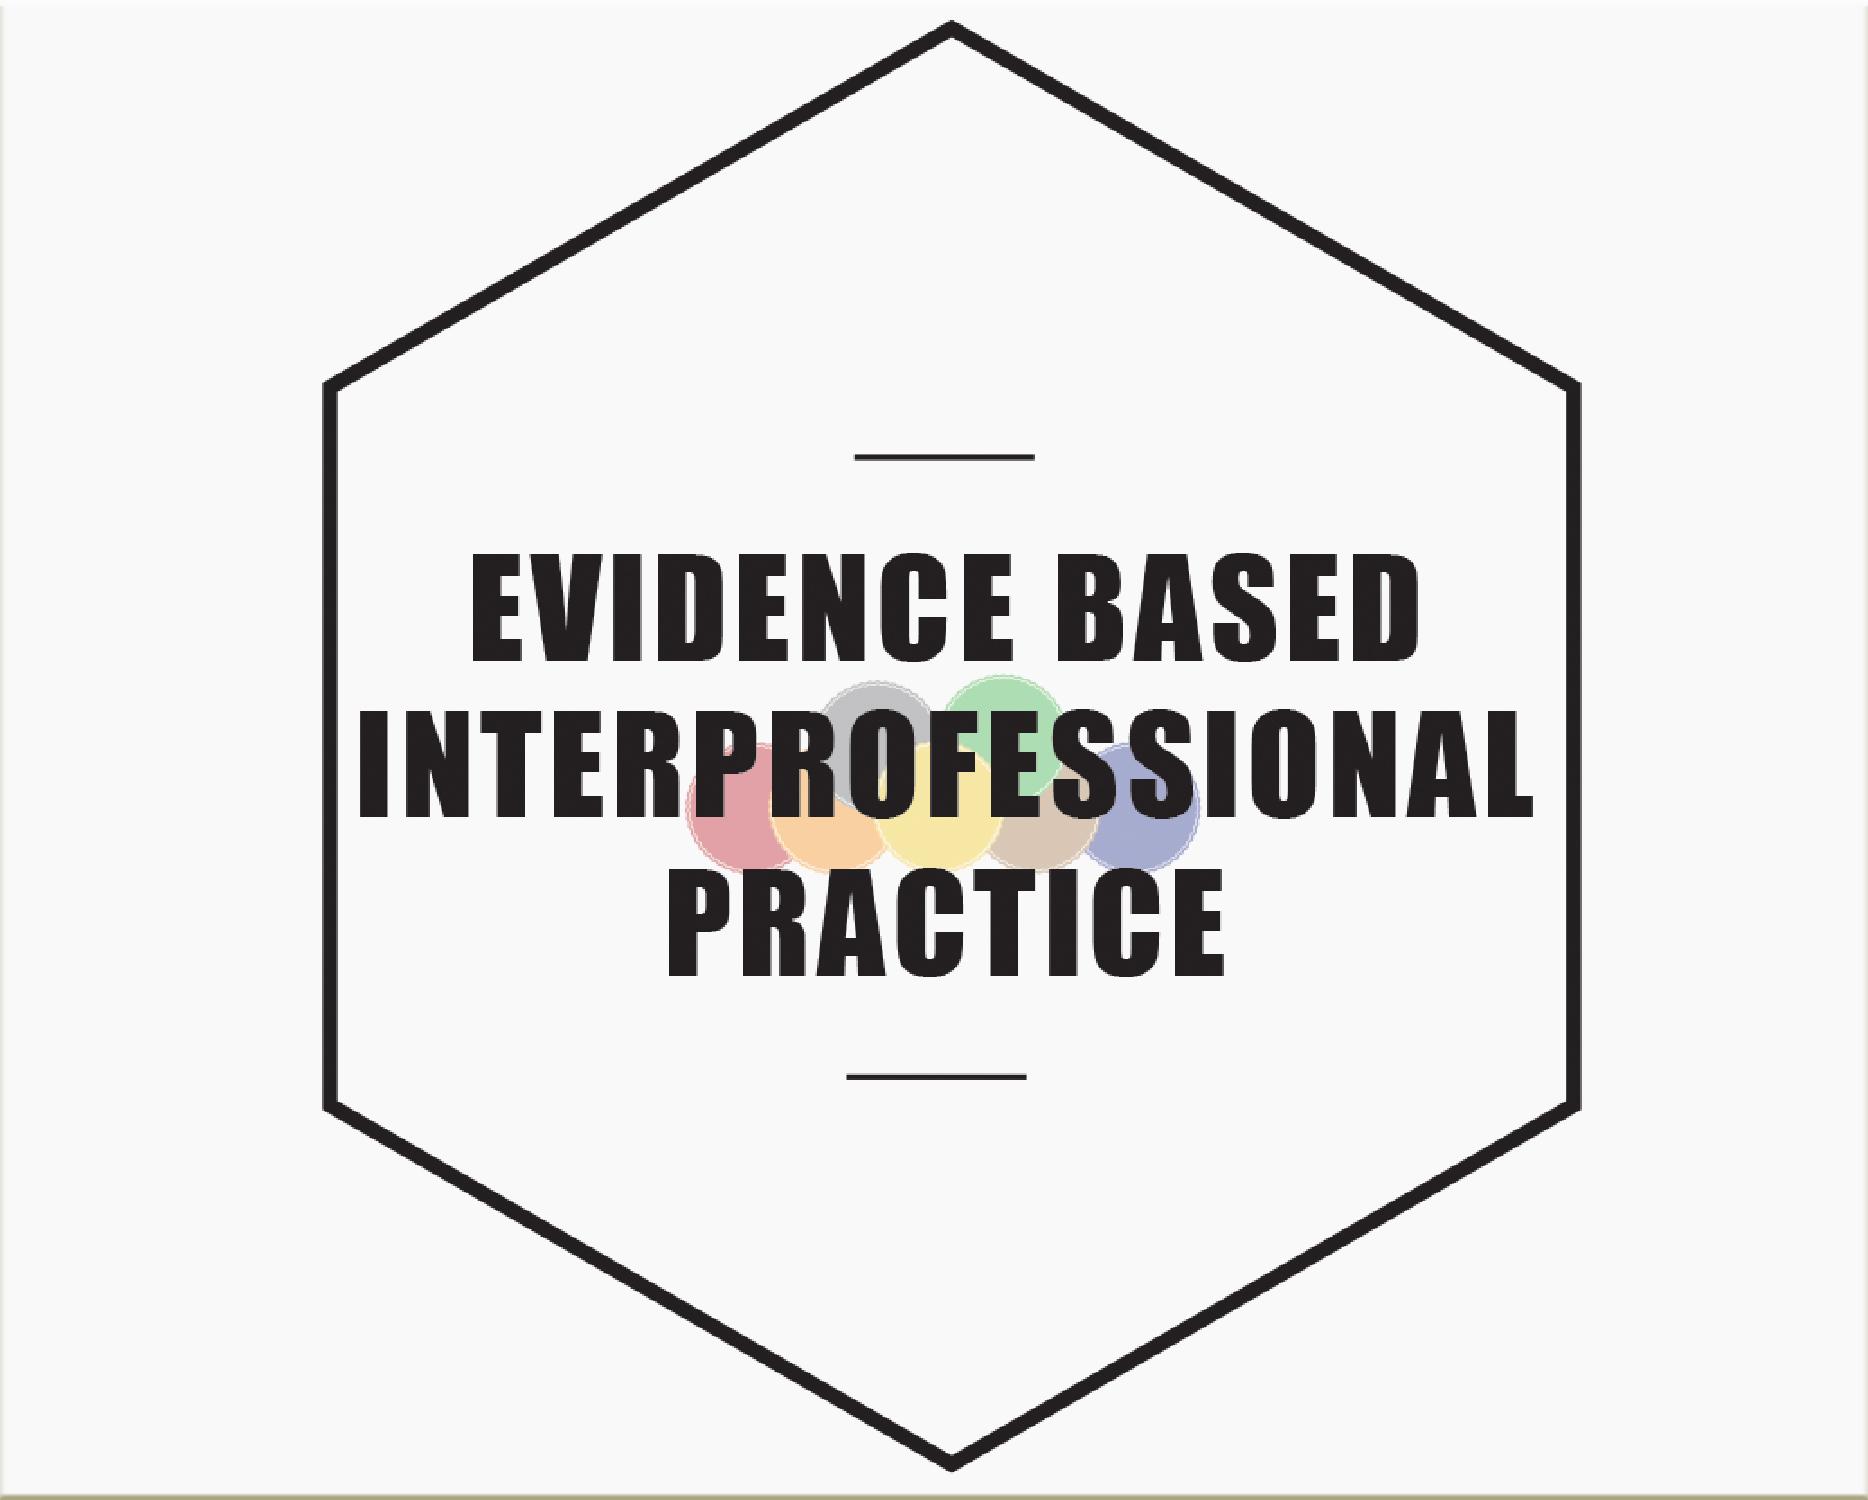 Evidence based interprofessional practice